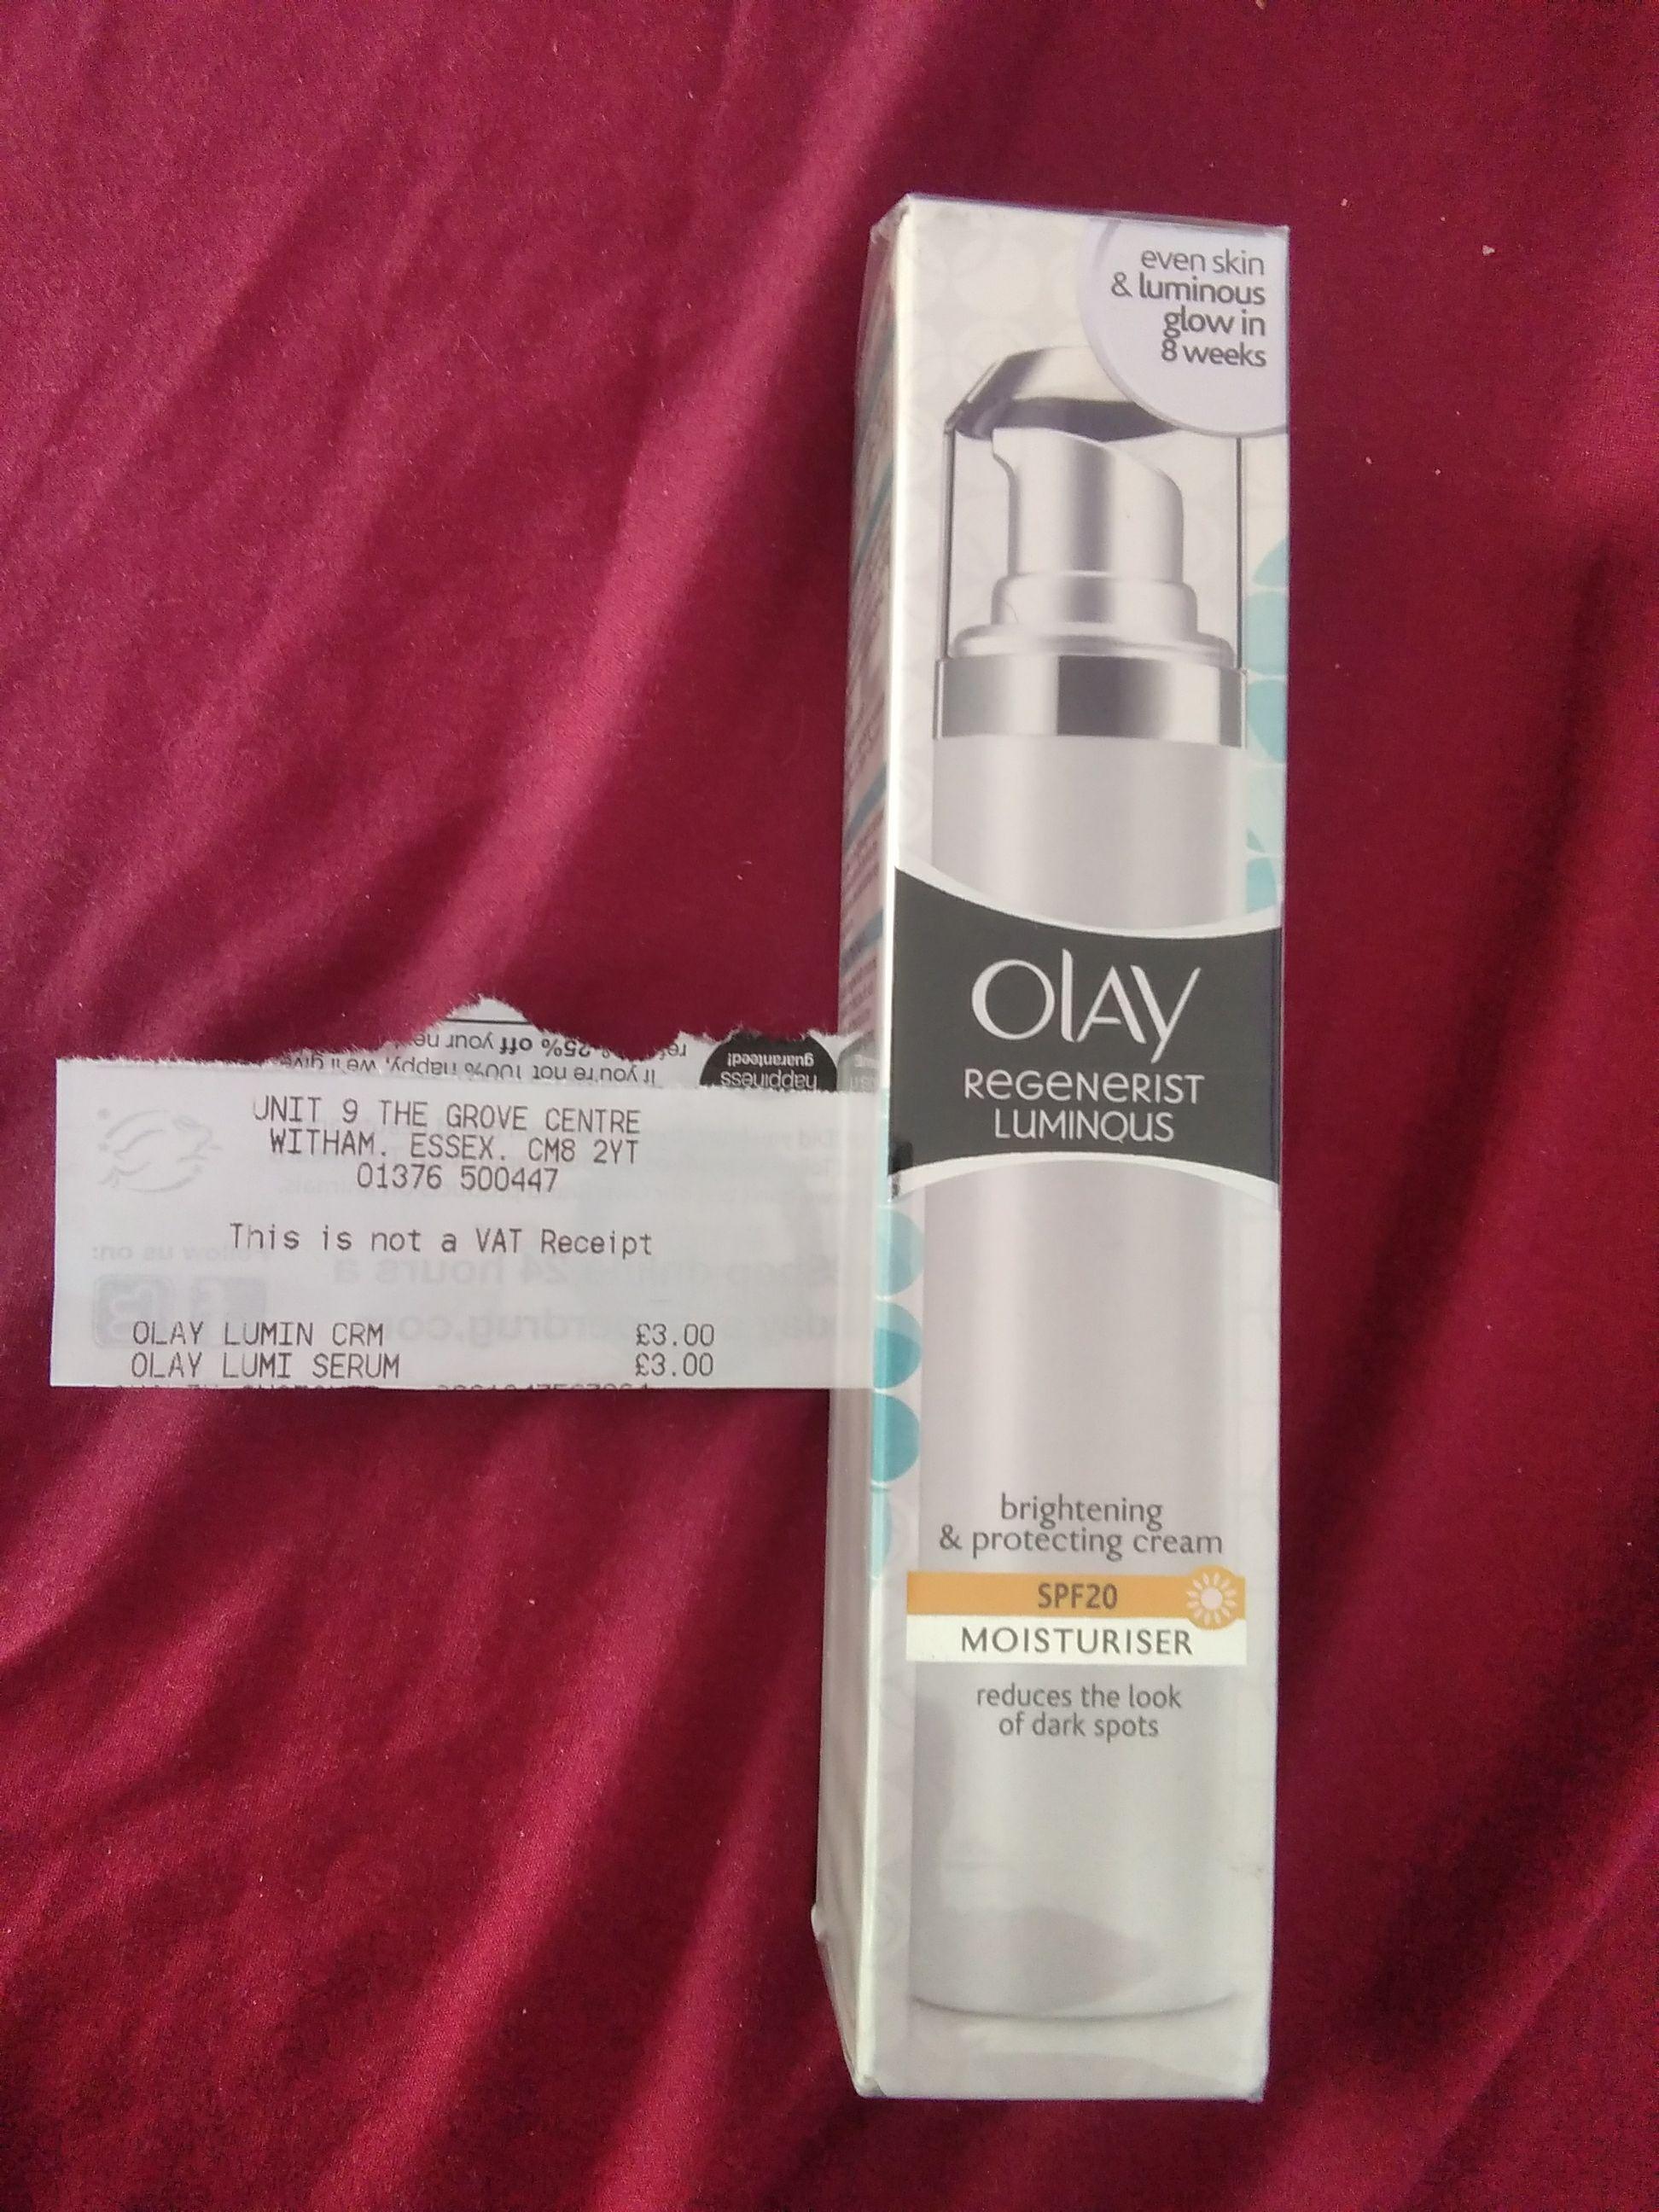 Olay Regenerist Luminous SPF20 Moisturiser £3 in Superdrug